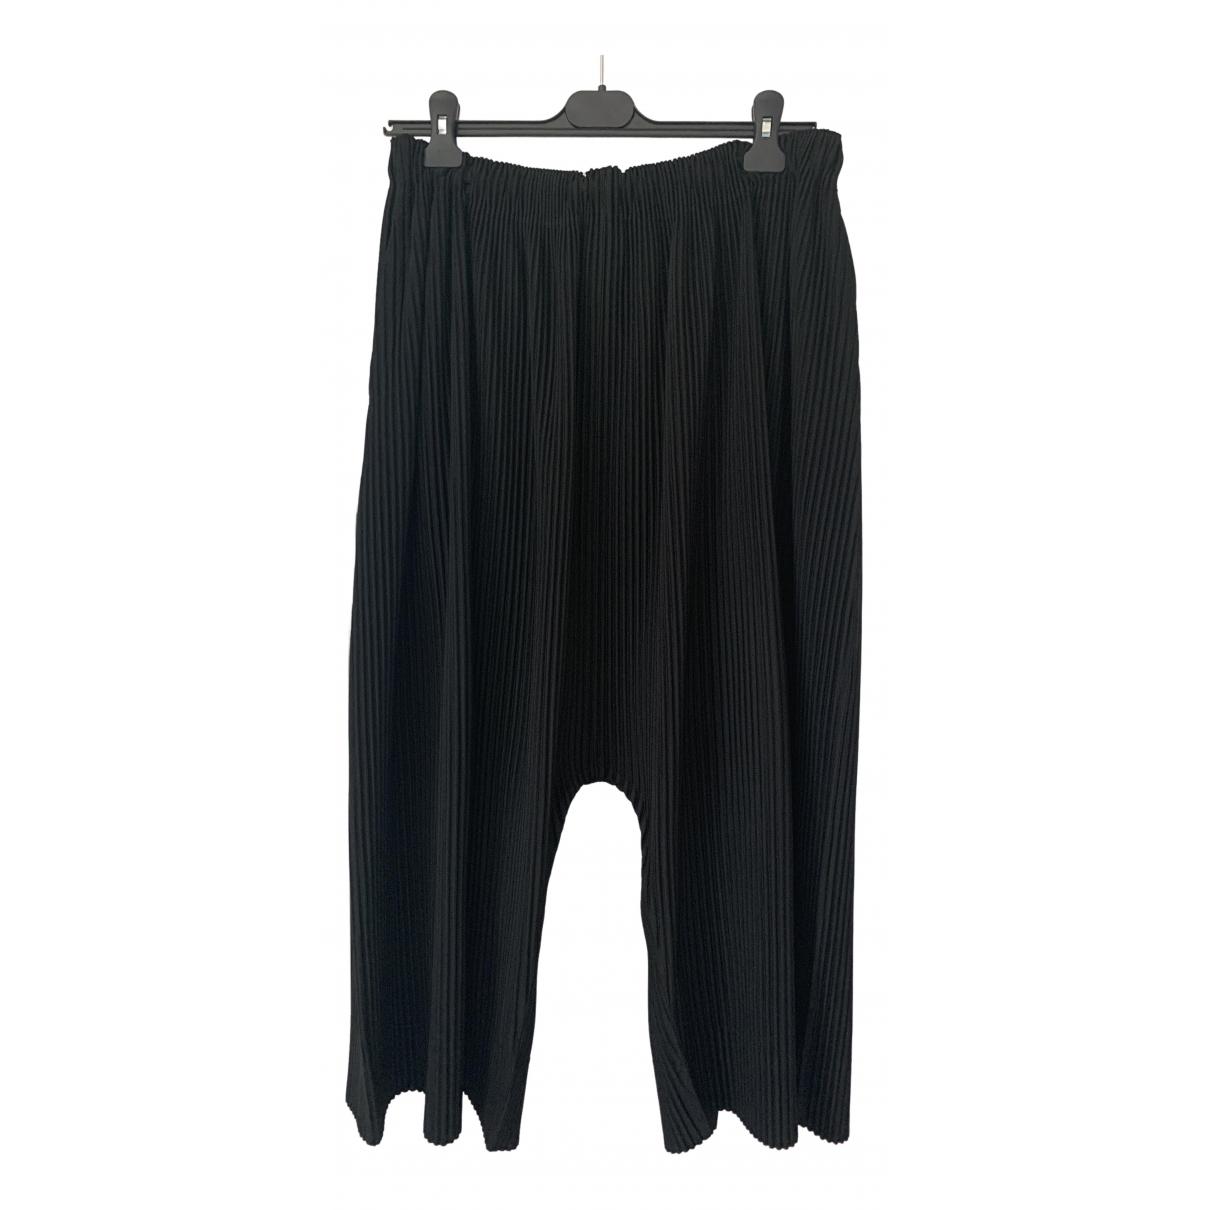 Issey Miyake \N Black Trousers for Men M International